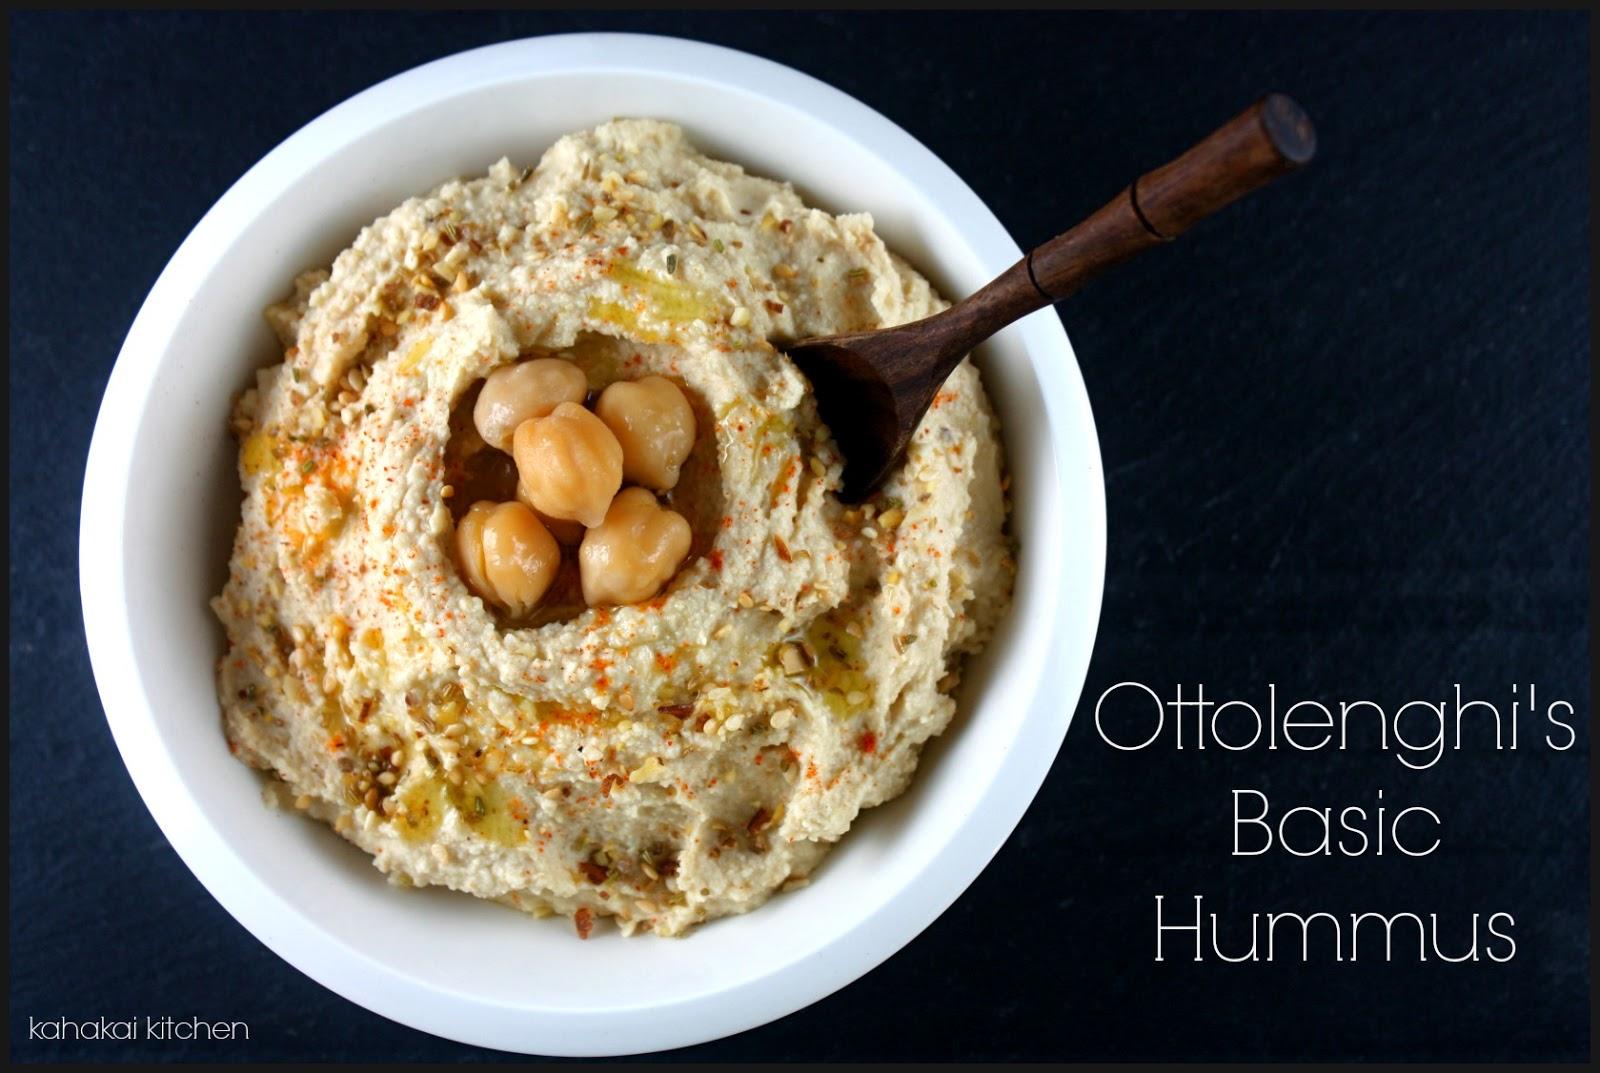 basic hummus ottolenghi